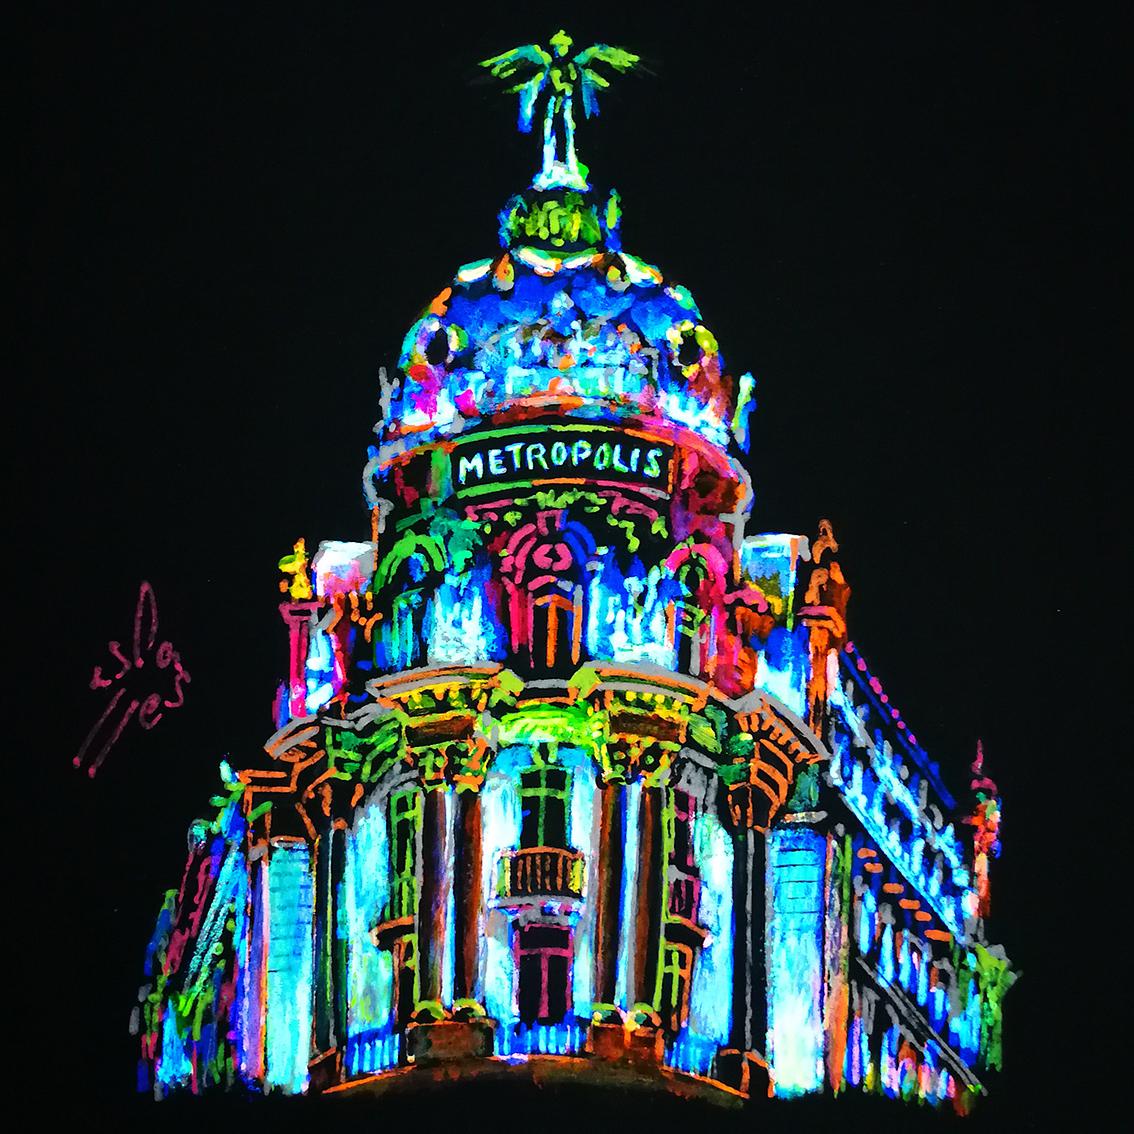 Edificio-Metropoli.-Fluorescent-Illustrations.-Night-City-Lights-Collection-by-Vicky-Casellas.-Fluorescent-art